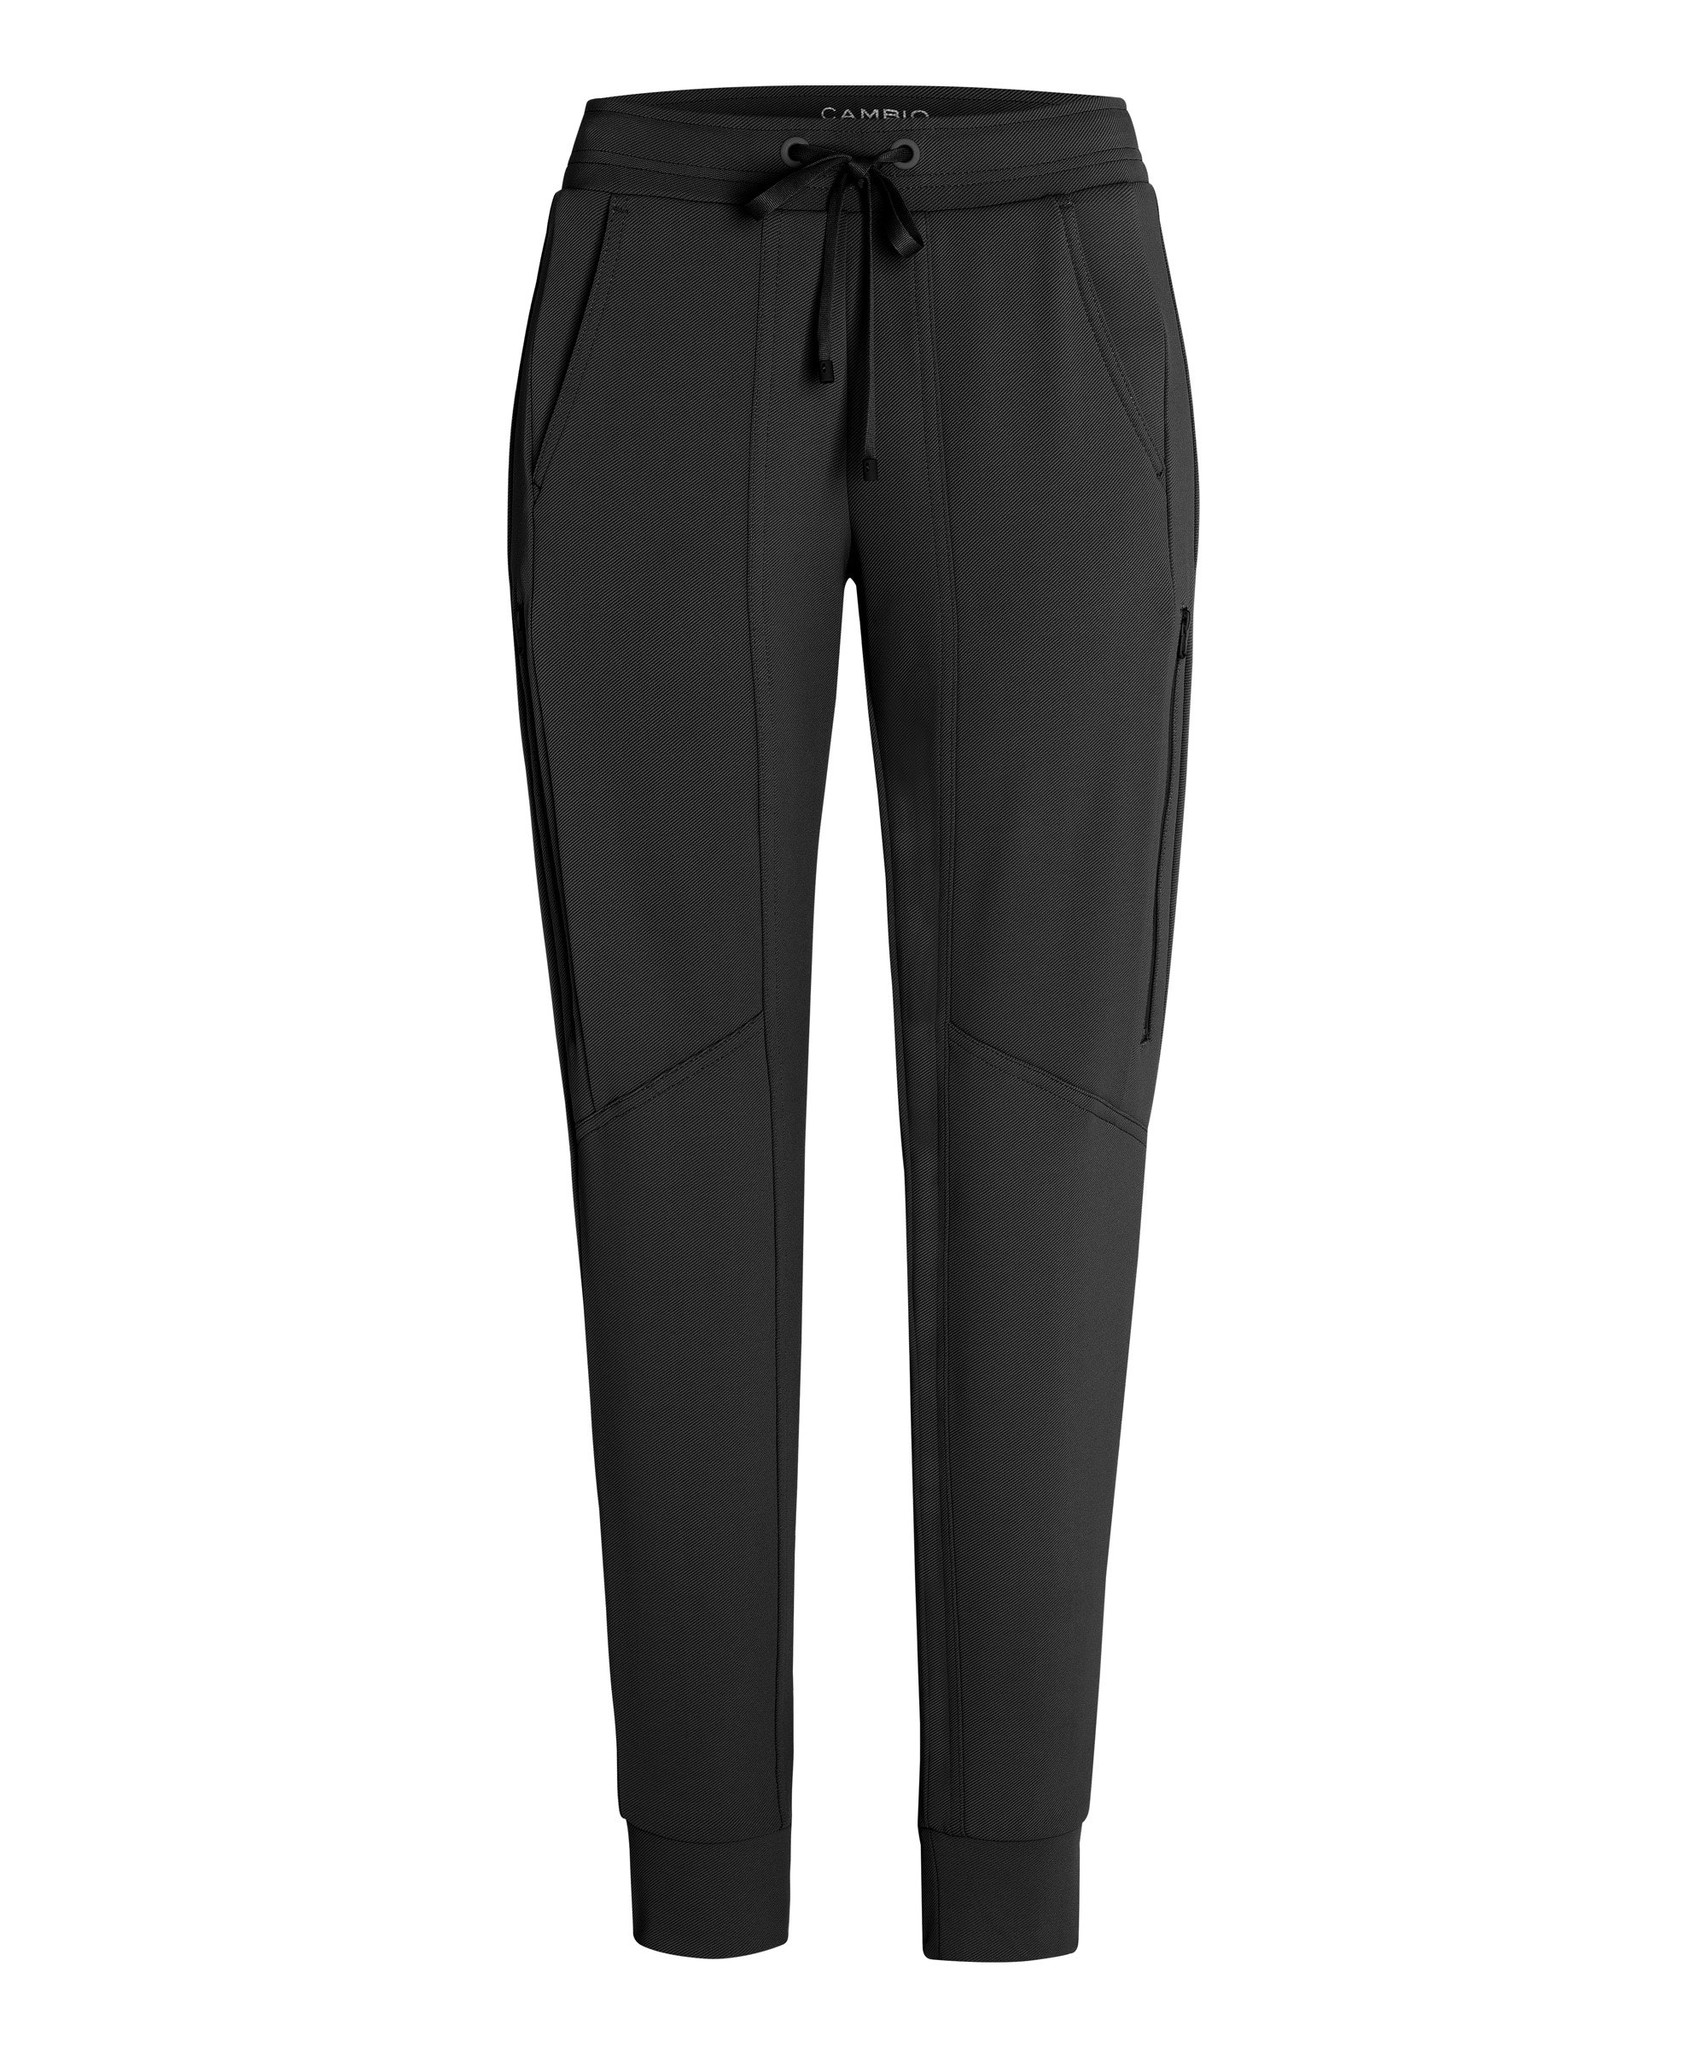 Cambio trousers JORDEN 6337-1